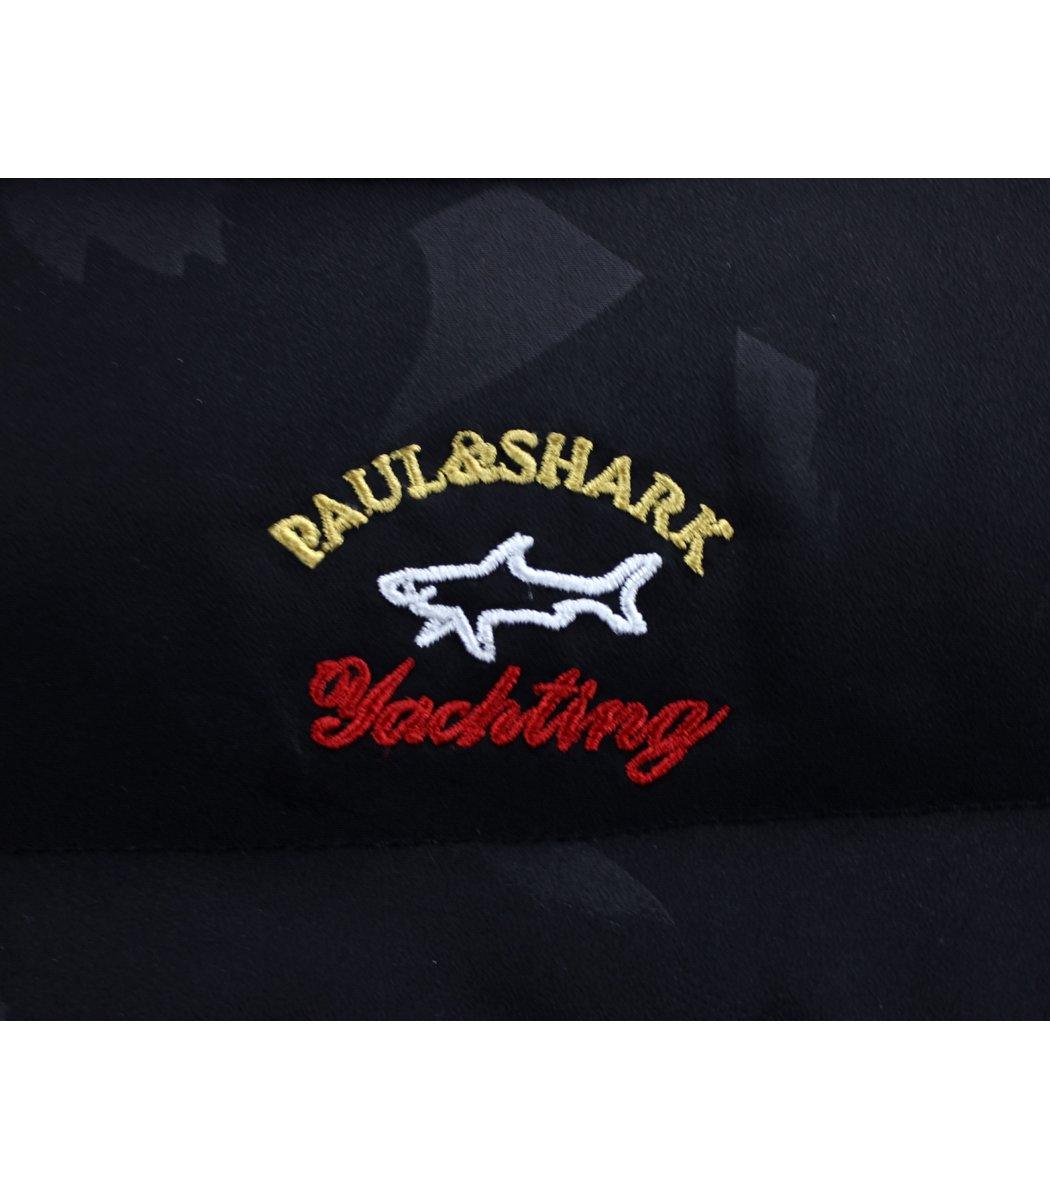 Пуховик  Paul&Shark PS4 Print  (Черный)